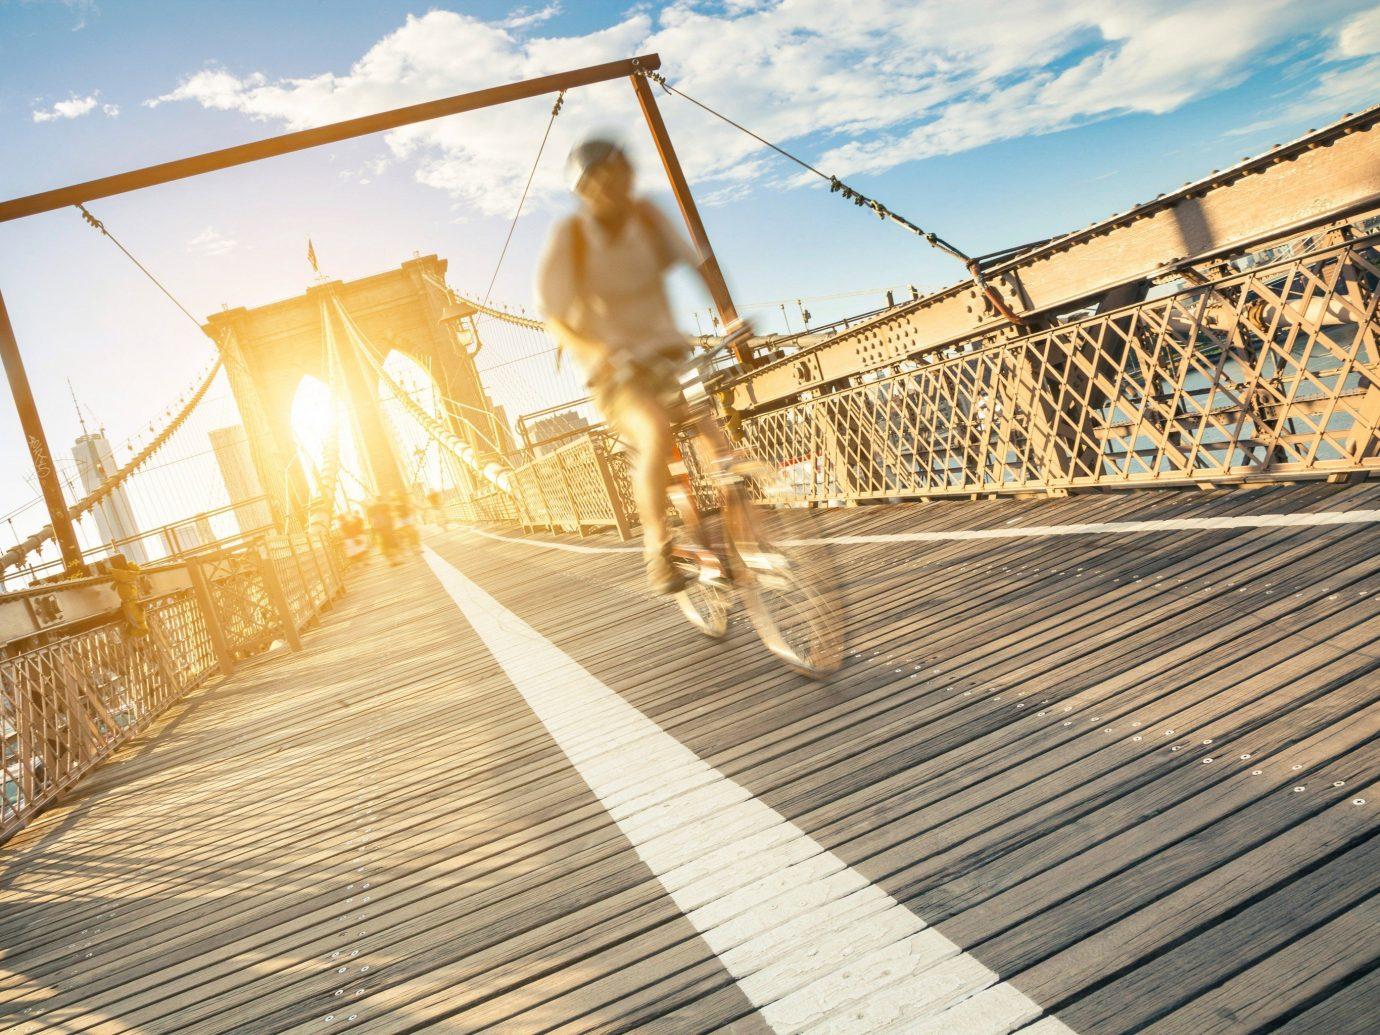 Health + Wellness Trip Ideas sky outdoor walkway bridge boardwalk sunlight wood roof track